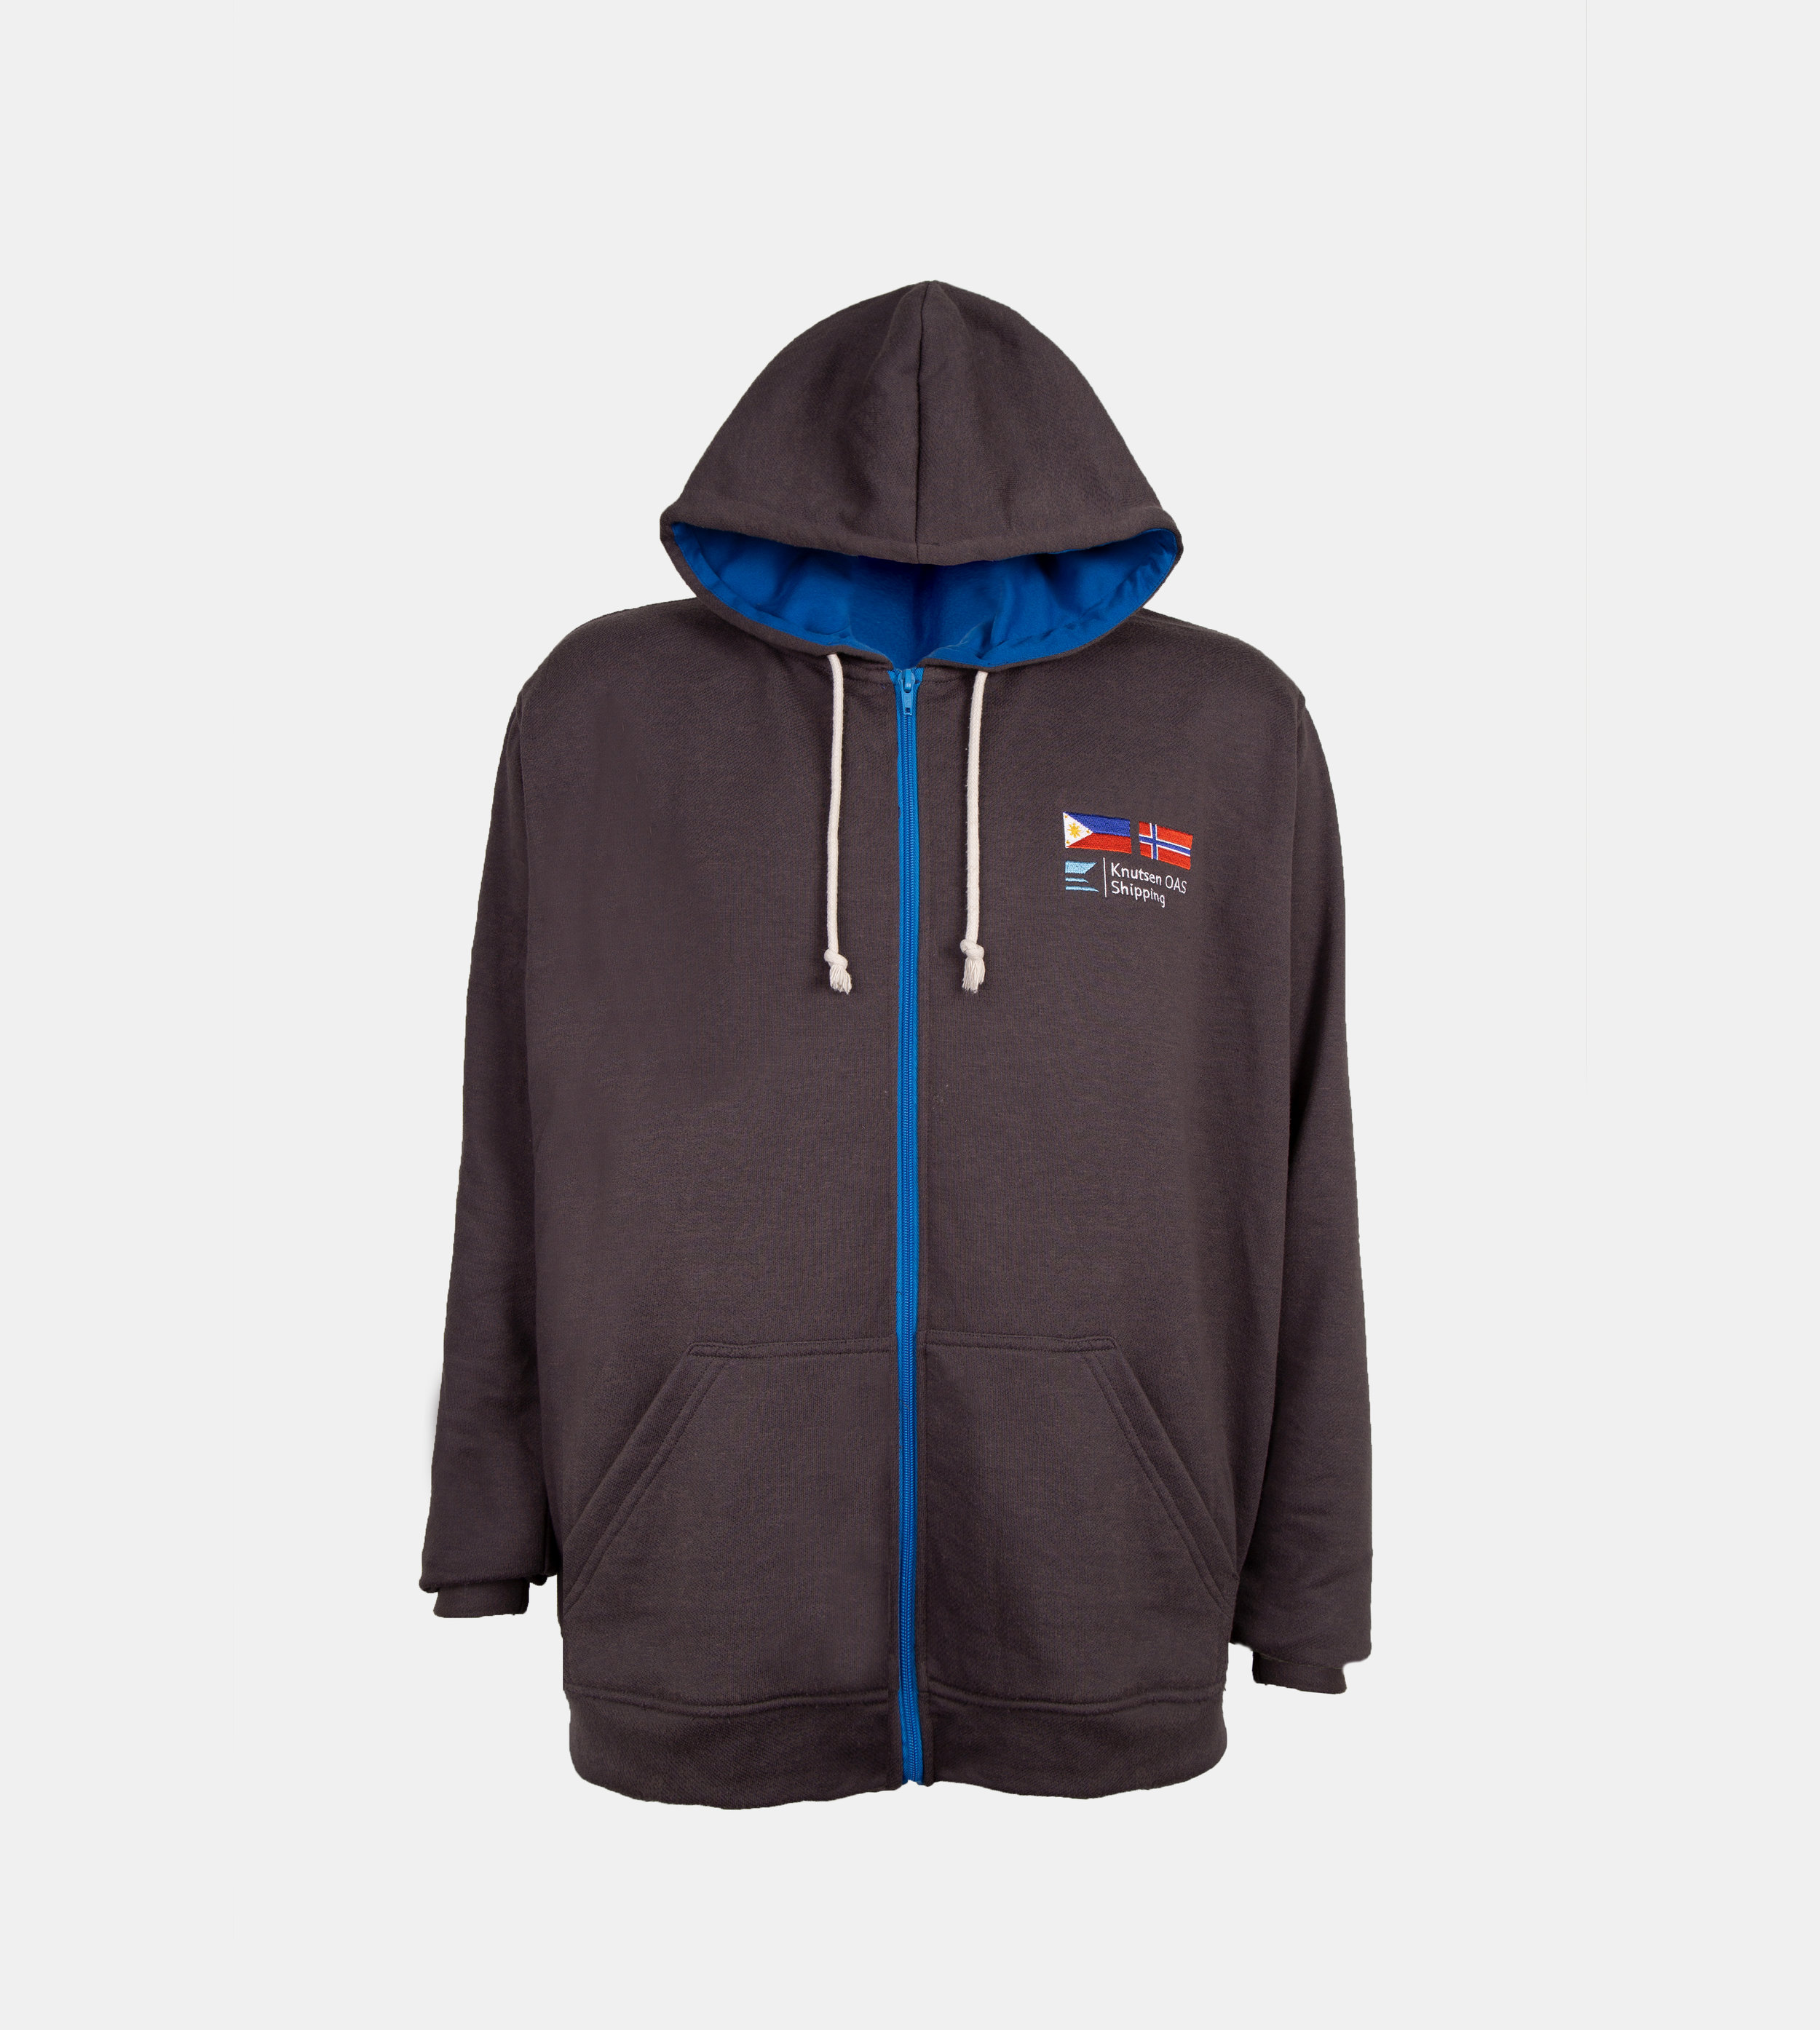 Tailored Projects-Custom Jacket-Zip Hoodie-Knutsen.jpg